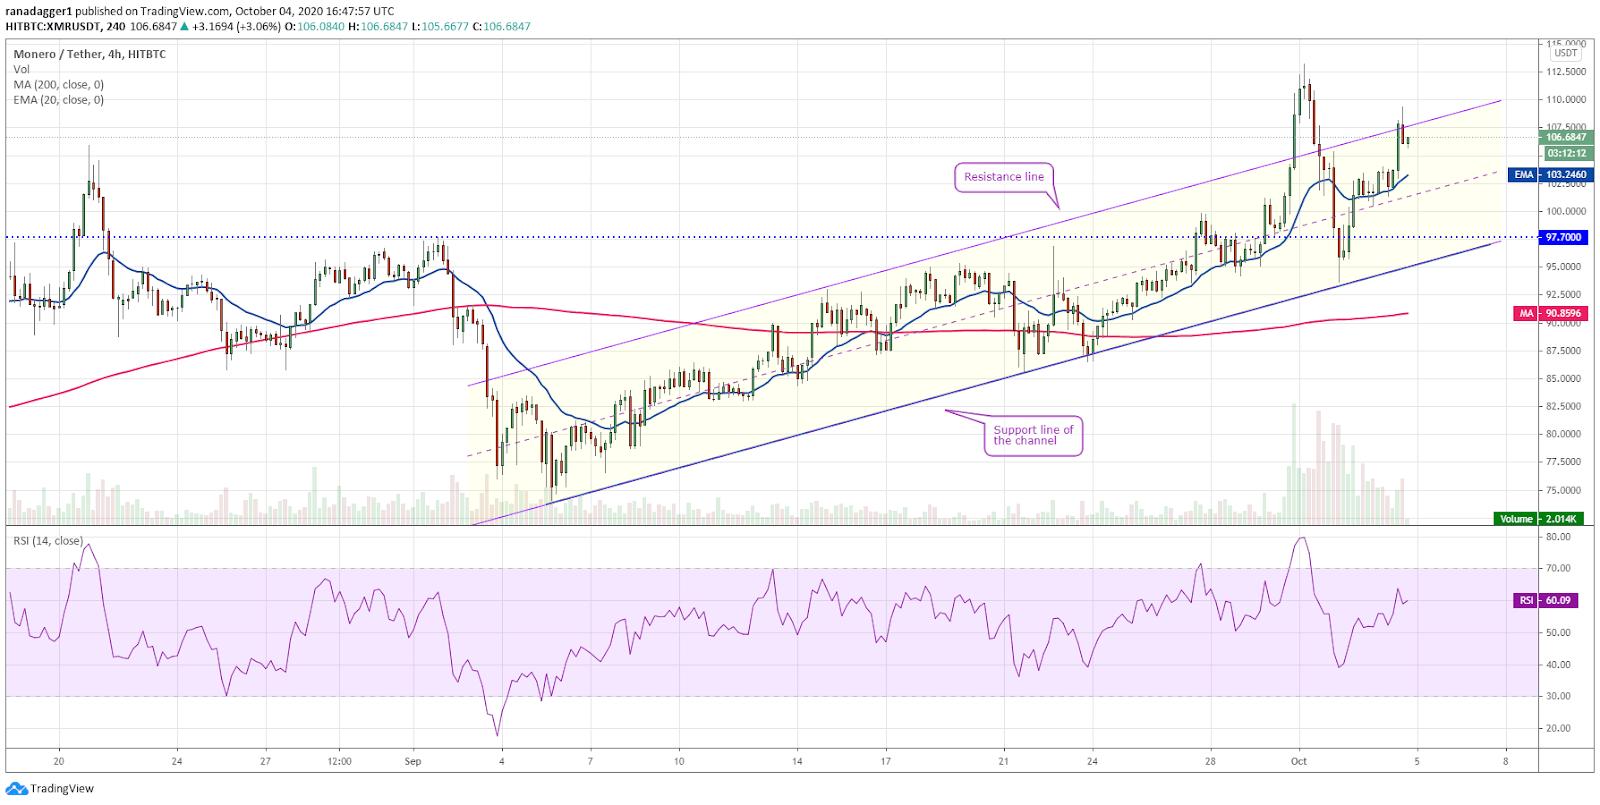 XMR/USD 4-hour chart. Source: TradingView